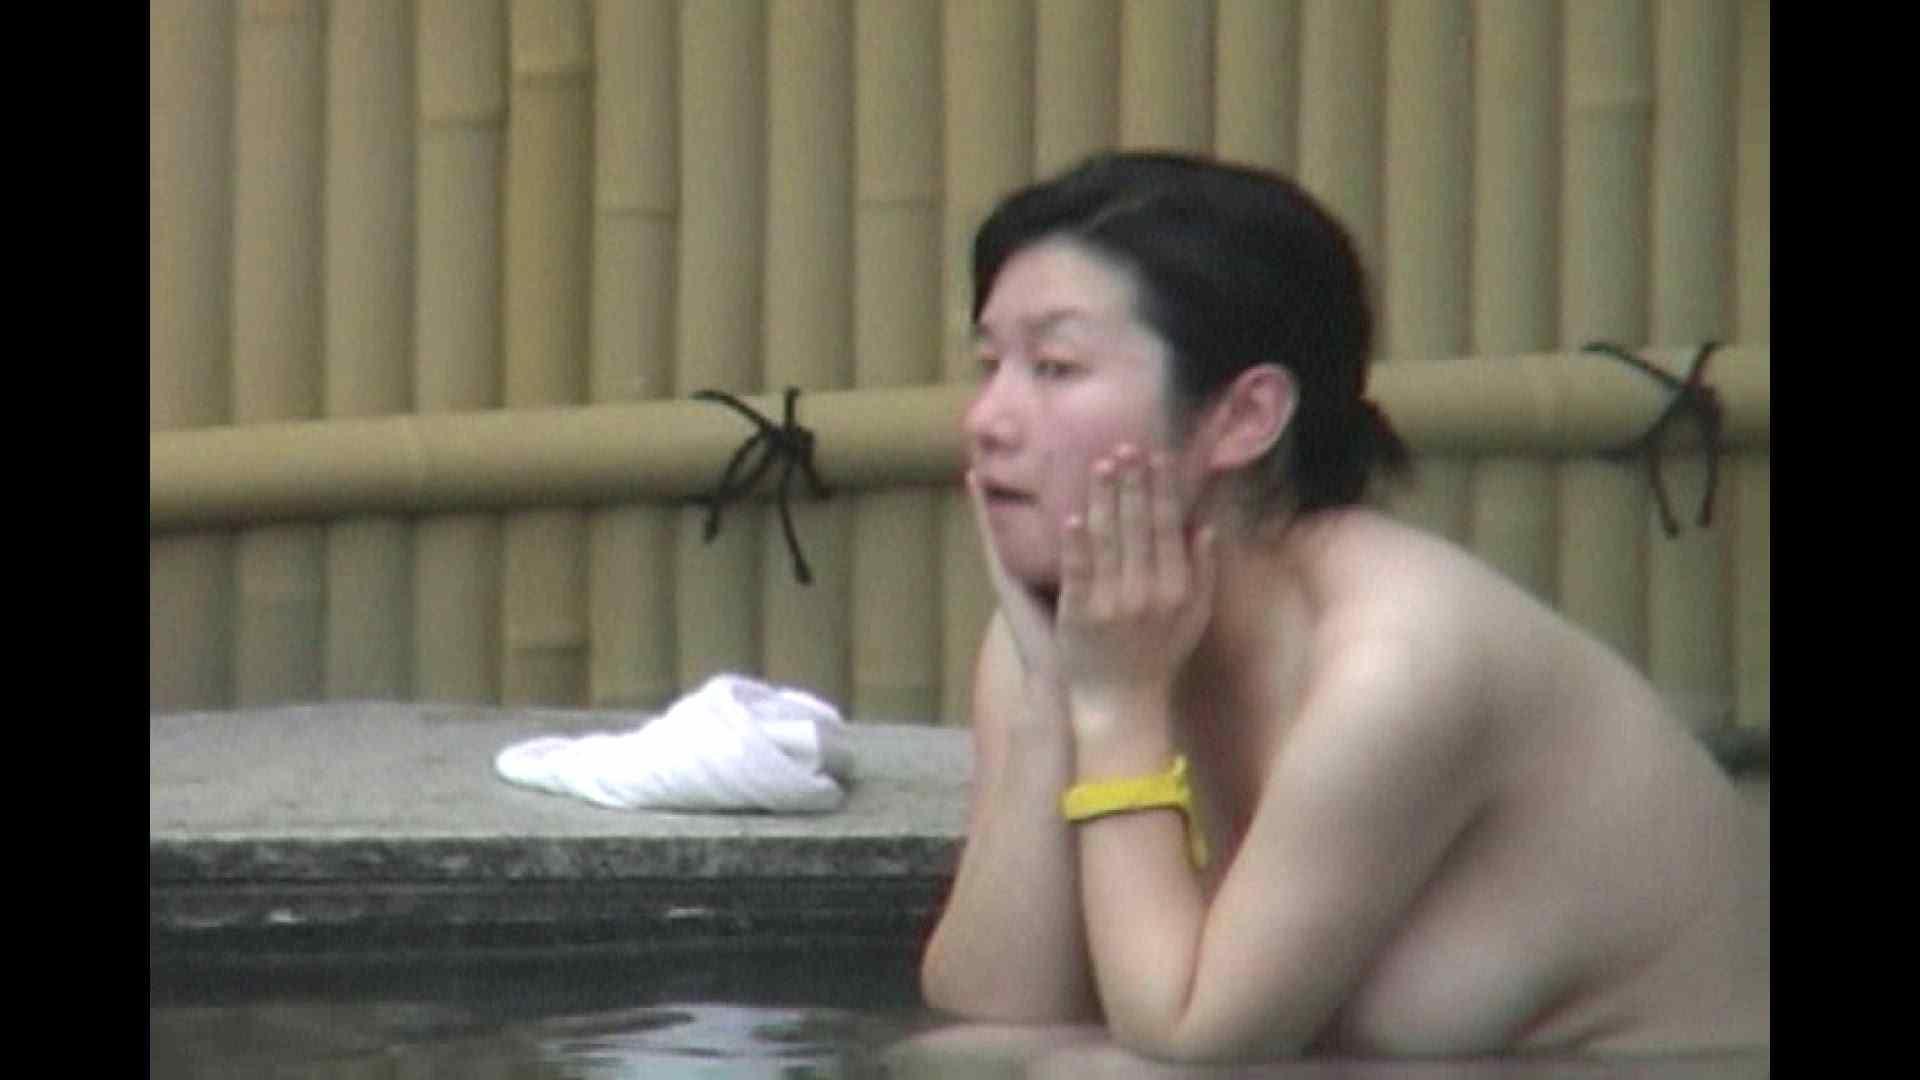 Aquaな露天風呂Vol.545 0 | 0  69連発 21